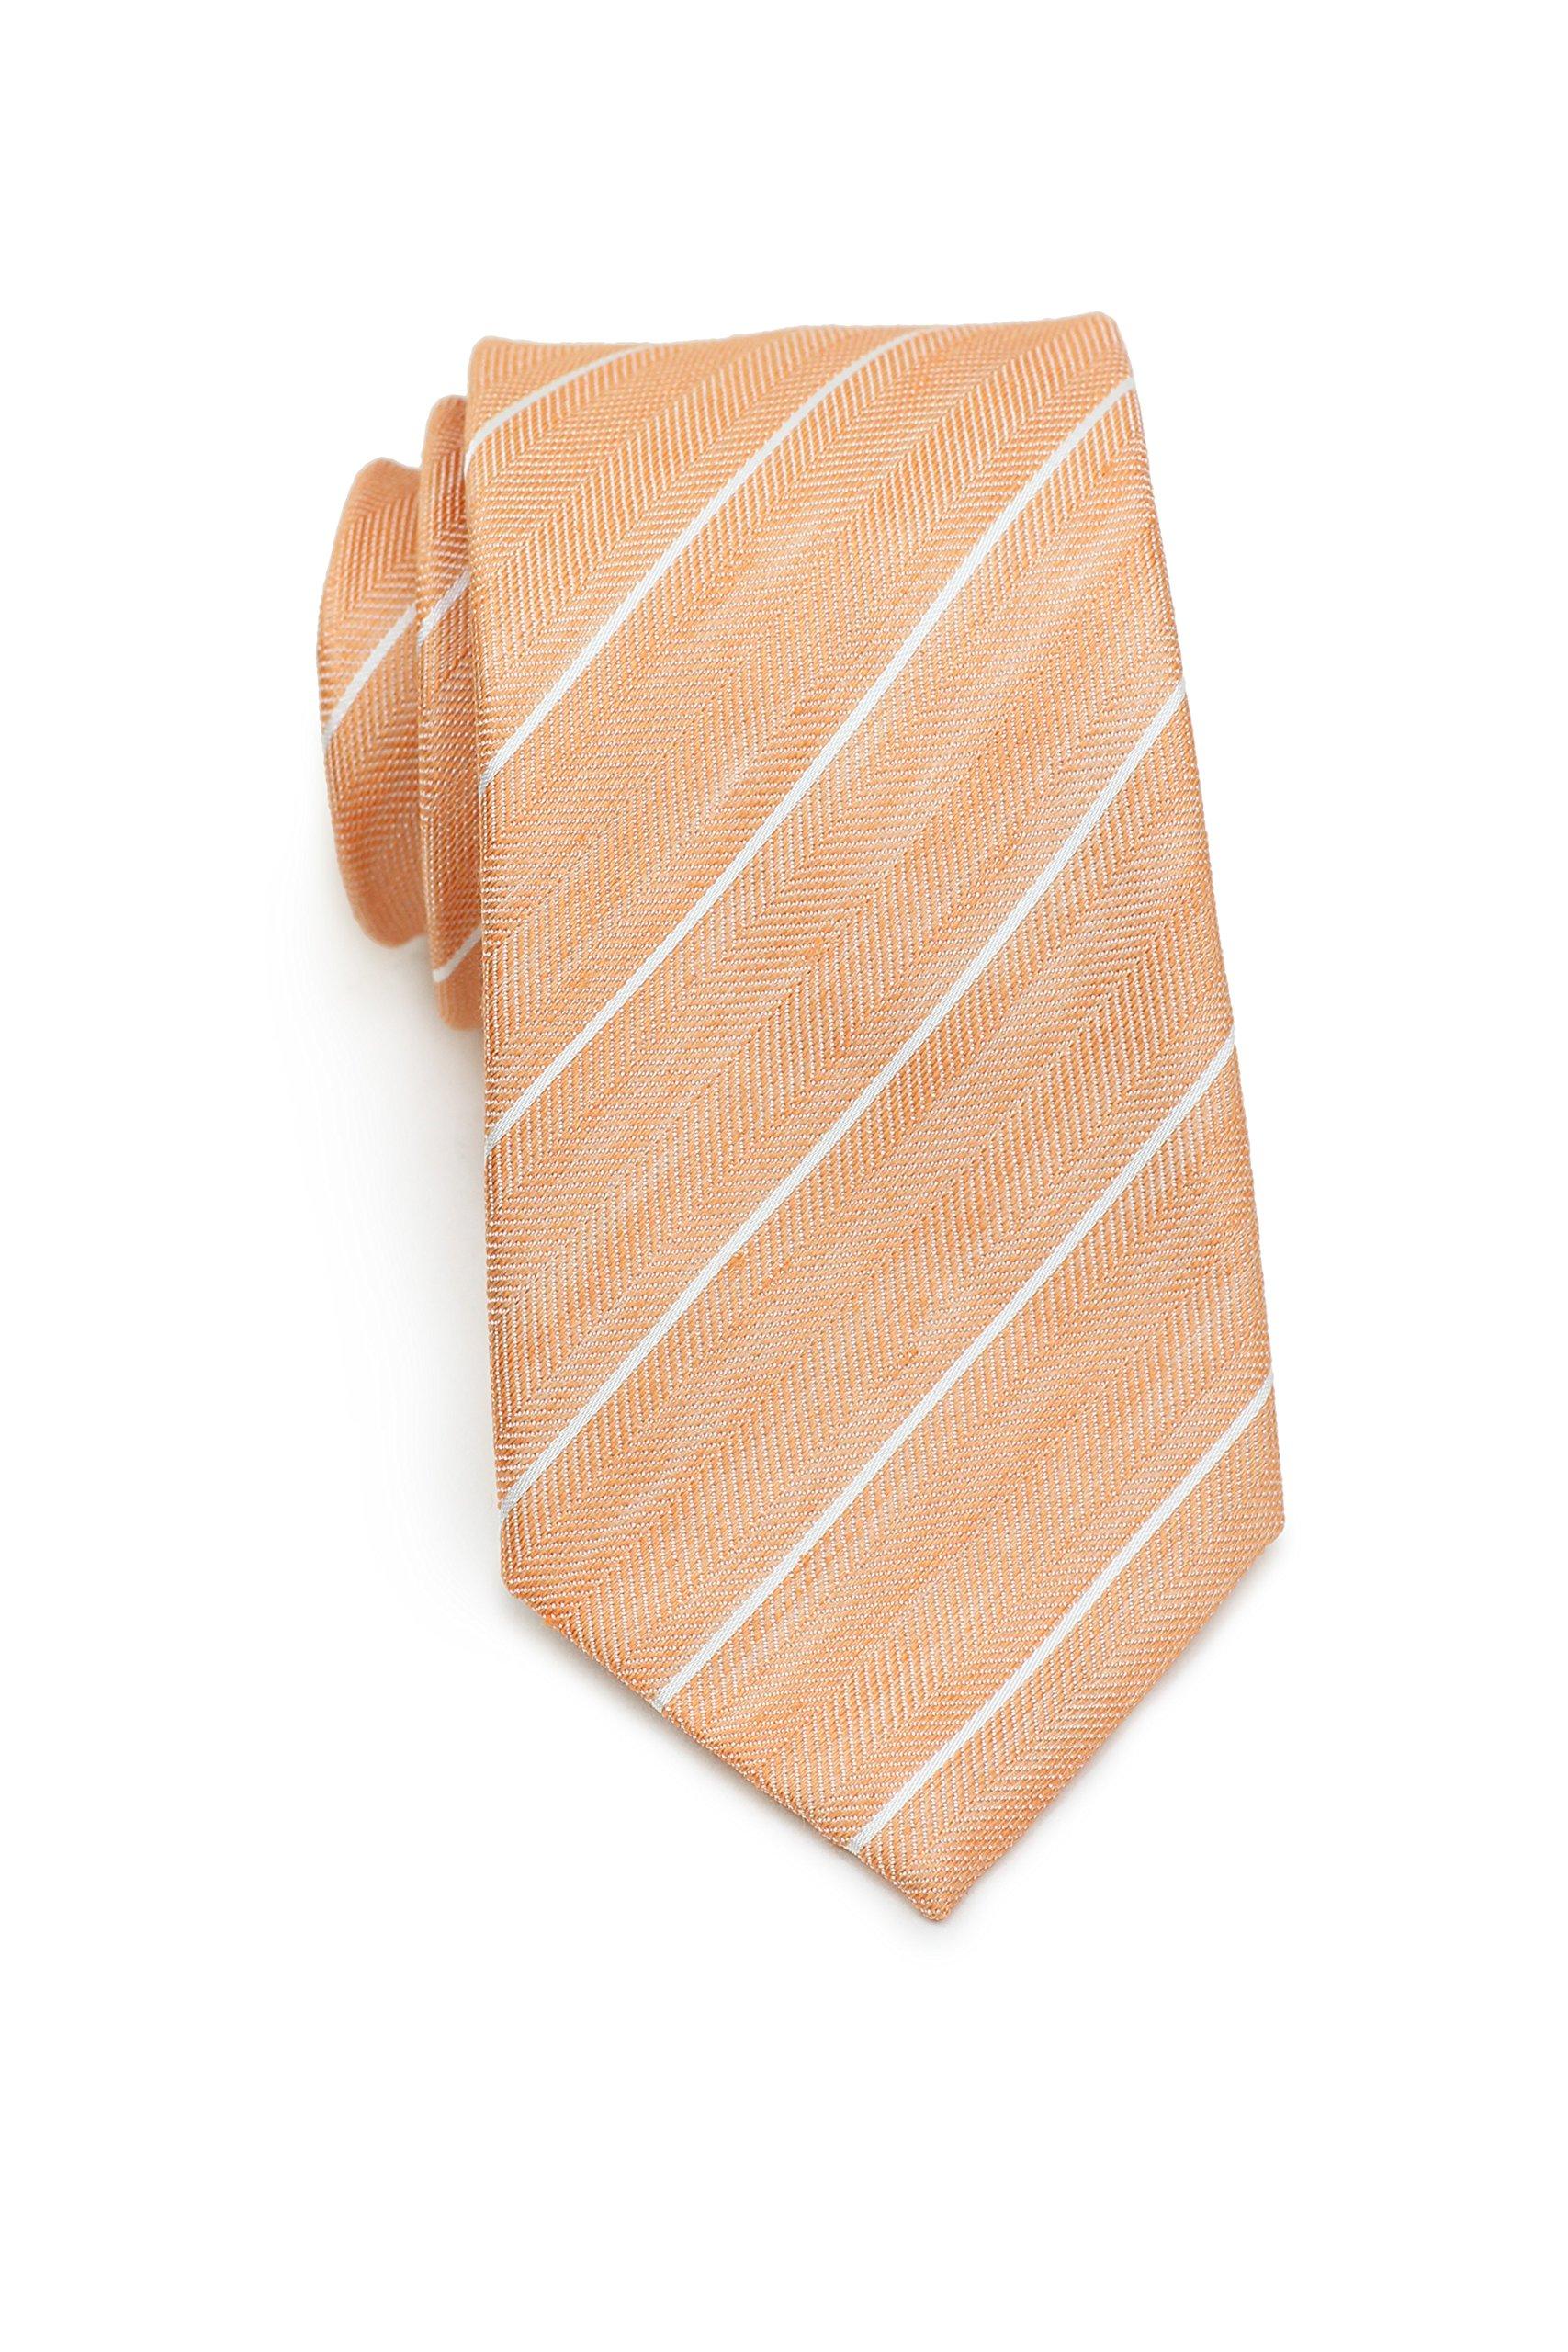 Bows-N-Ties Men's Necktie Summer Pastels Linen Skinny Matte Tie 2.75 Inches (Tangerine Orange Stripes)